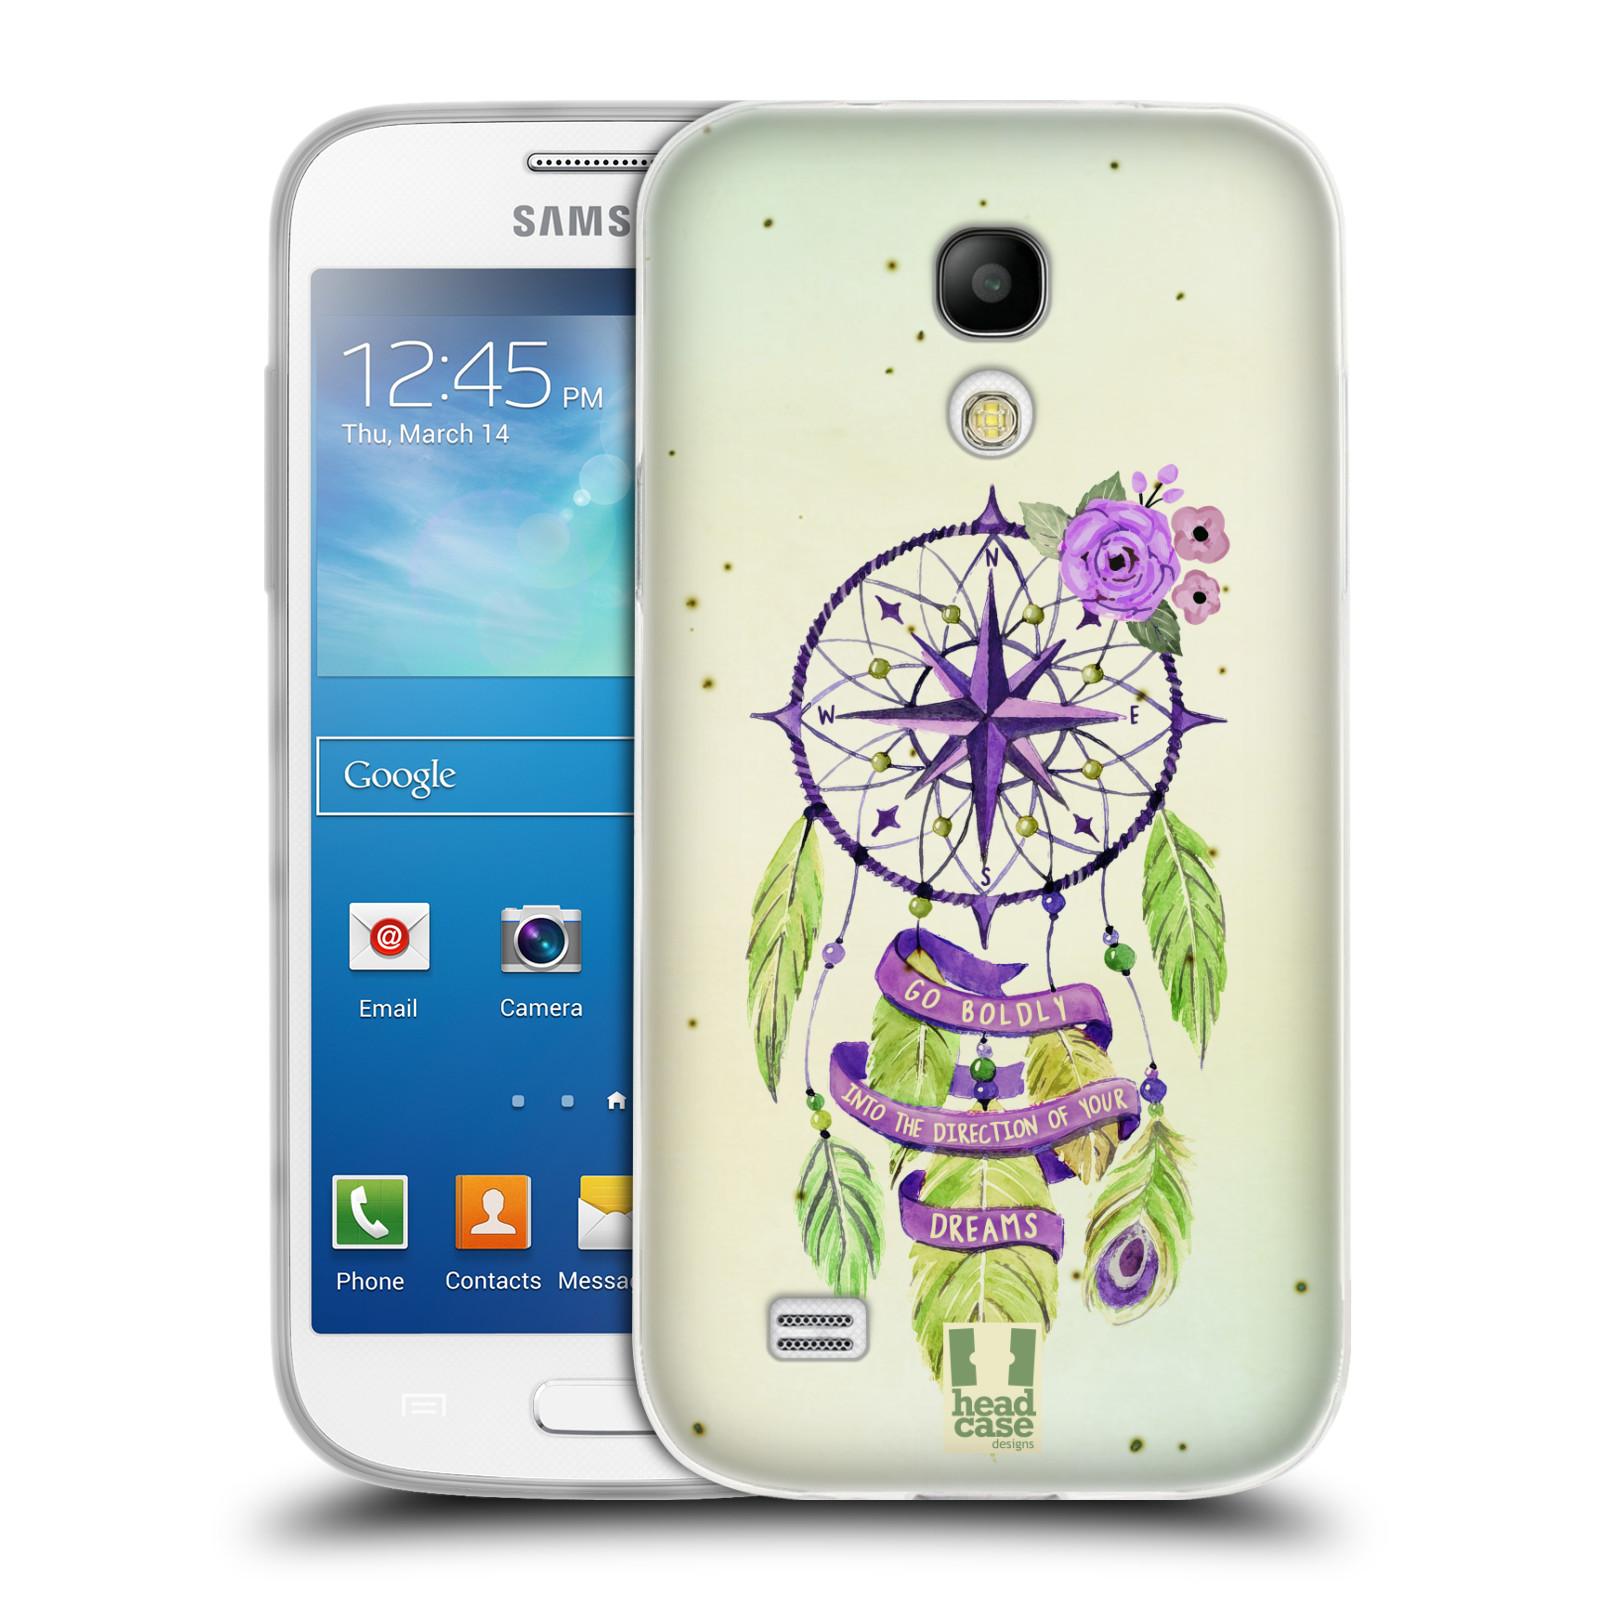 Silikonové pouzdro na mobil Samsung Galaxy S4 Mini HEAD CASE Lapač Assorted Compass (Silikonový kryt či obal na mobilní telefon Samsung Galaxy S4 Mini GT-i9195 / i9190)